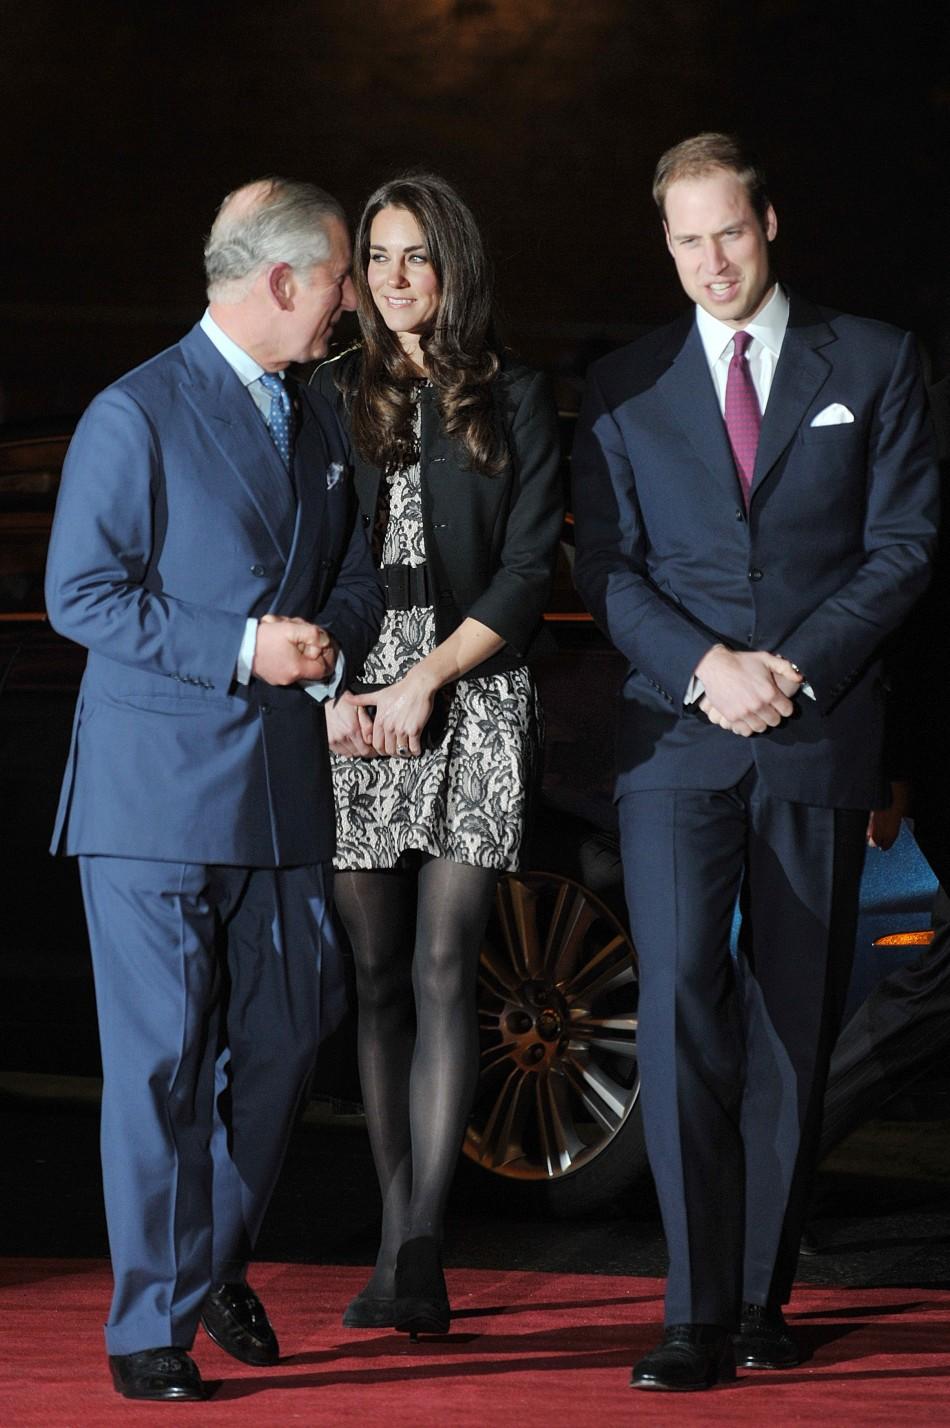 The Royals Arrive at the Royal Albert Hall